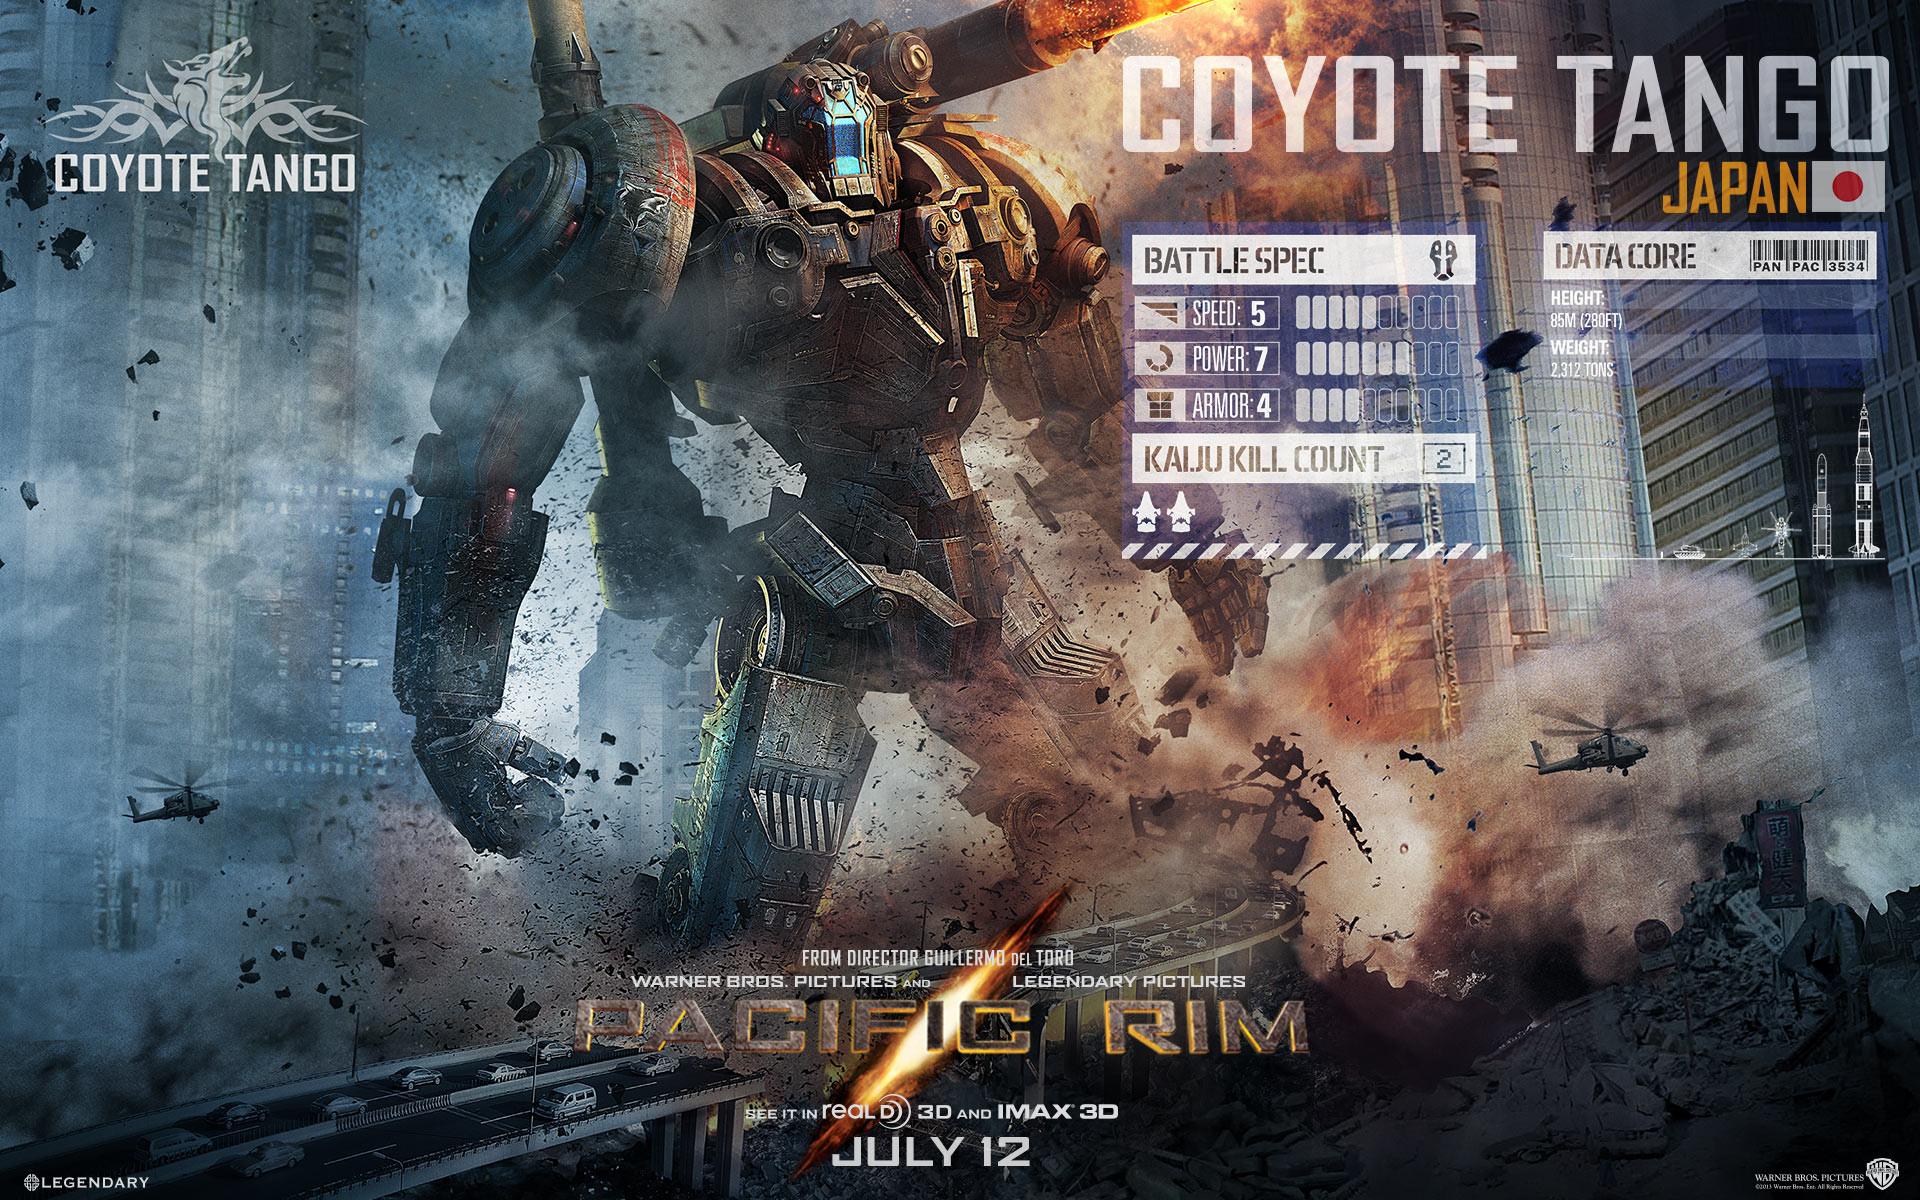 Pacific Rim Bilder Coyote Tango - 763.7KB